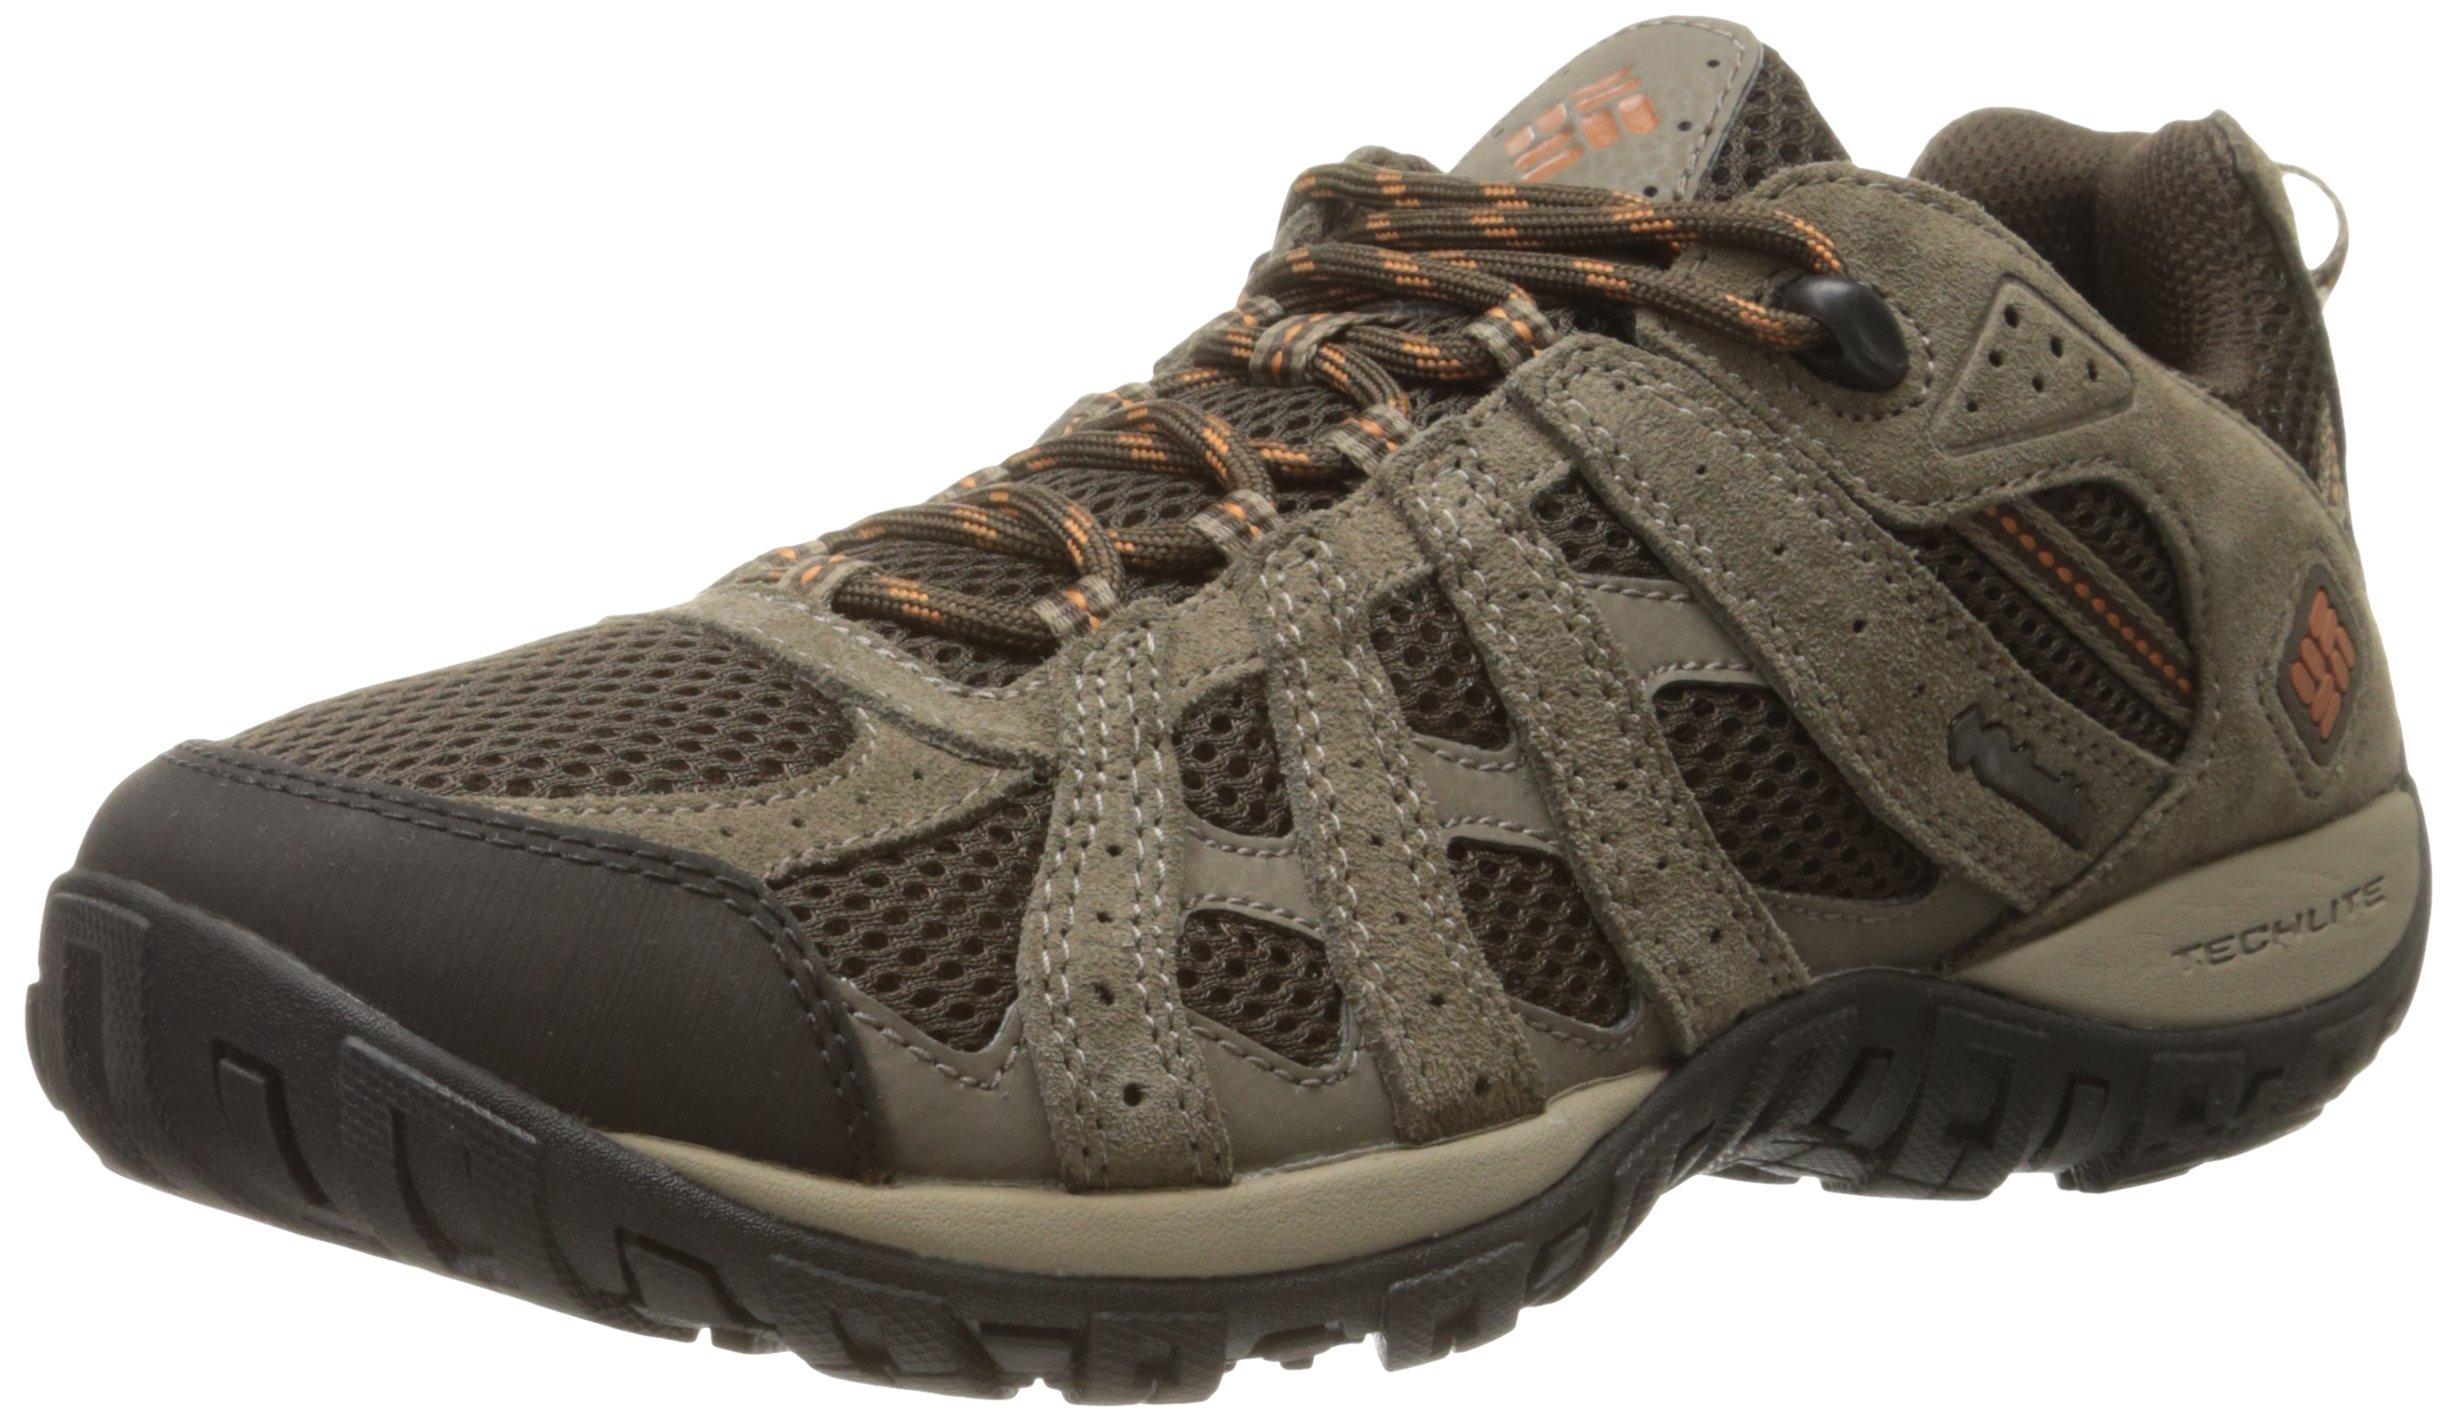 Columbia Men's Redmond Low Hiking Shoe, Cordovan/Dark, 10 M US by Columbia